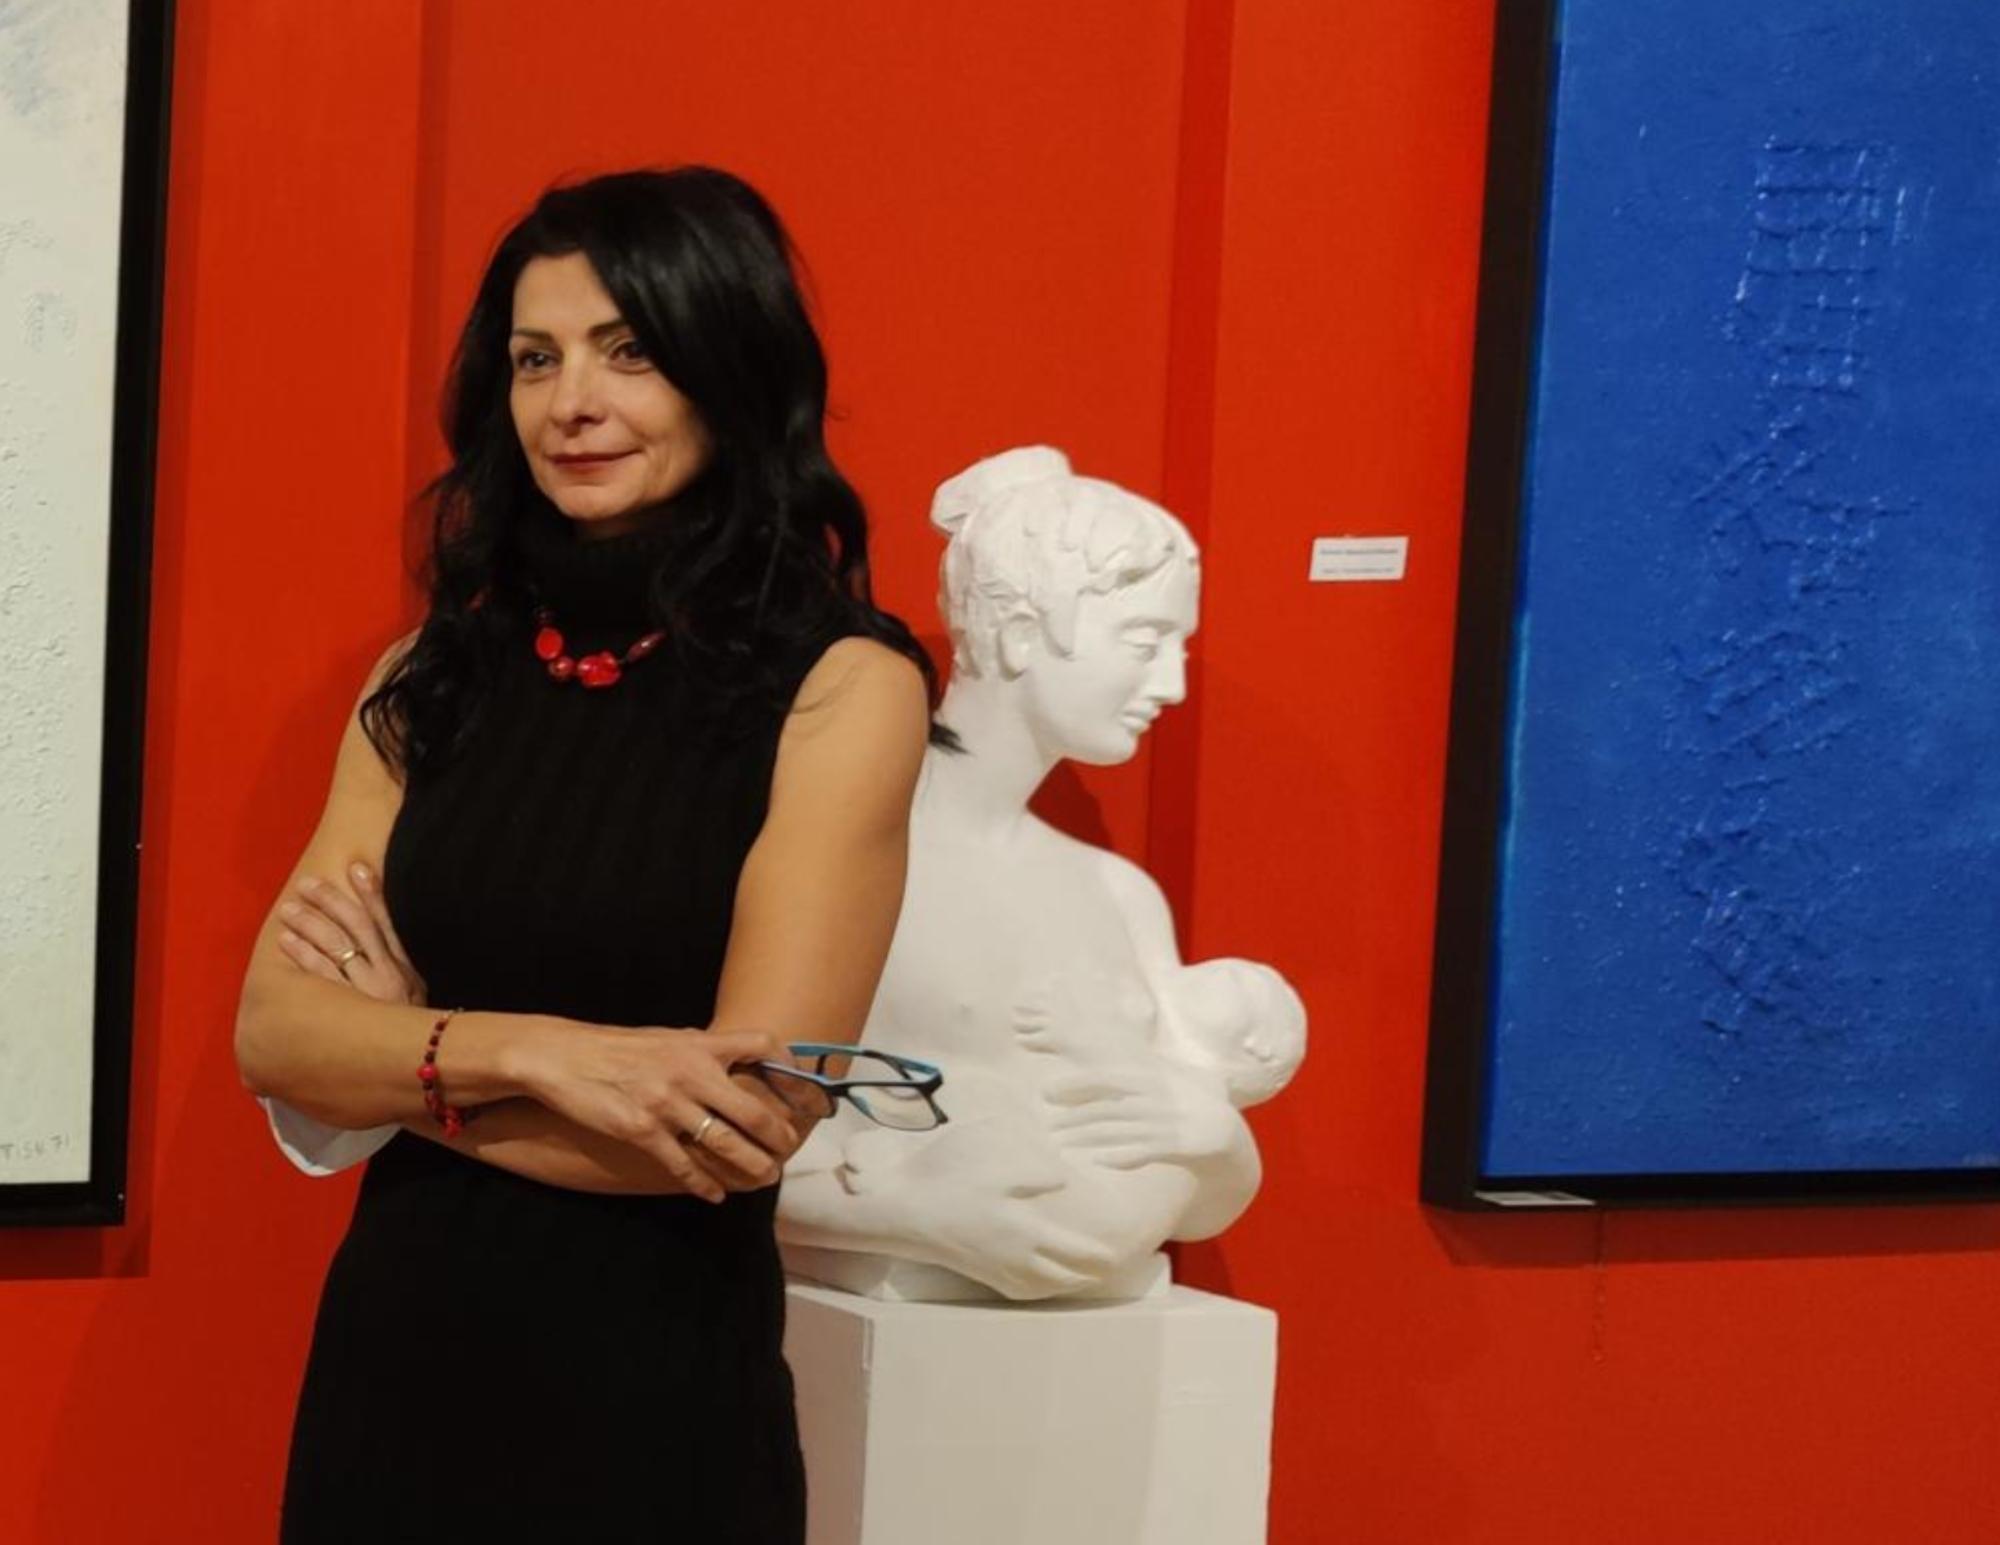 http://martalock.net/wp-content/uploads/2021/10/Beatrice-Mihaela-Roman.jpg